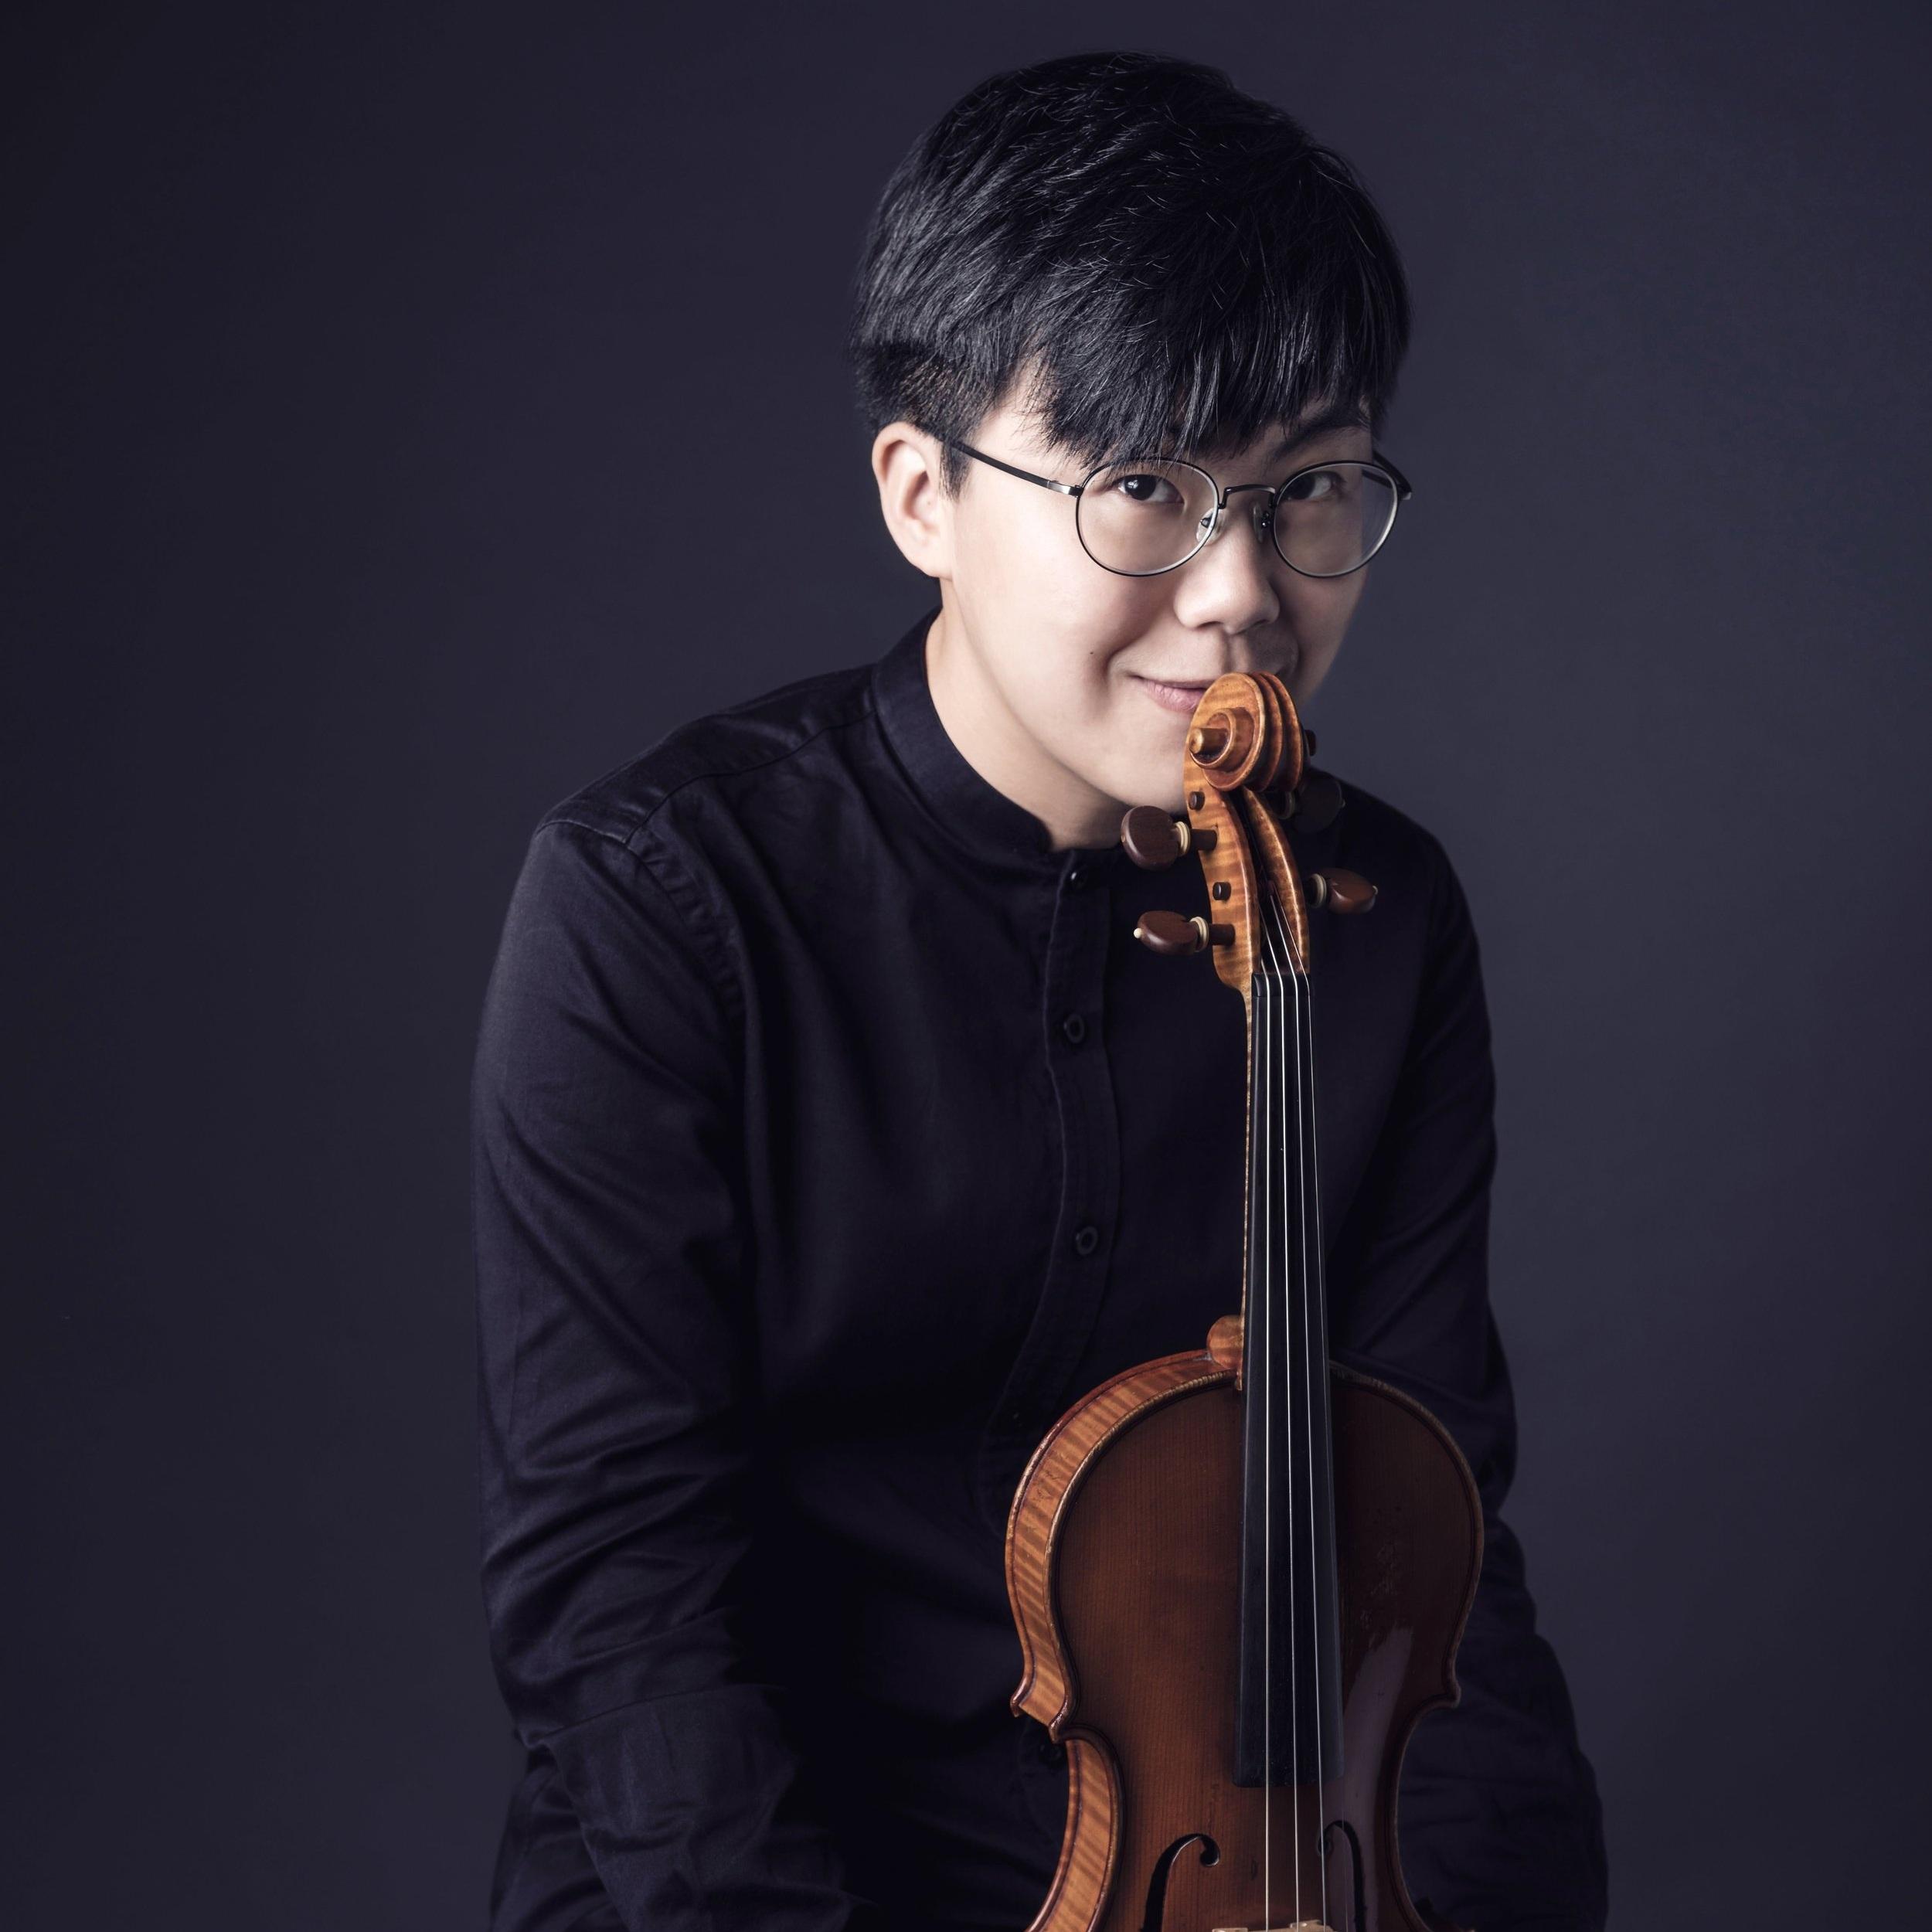 Vivian Ting-chia Shen